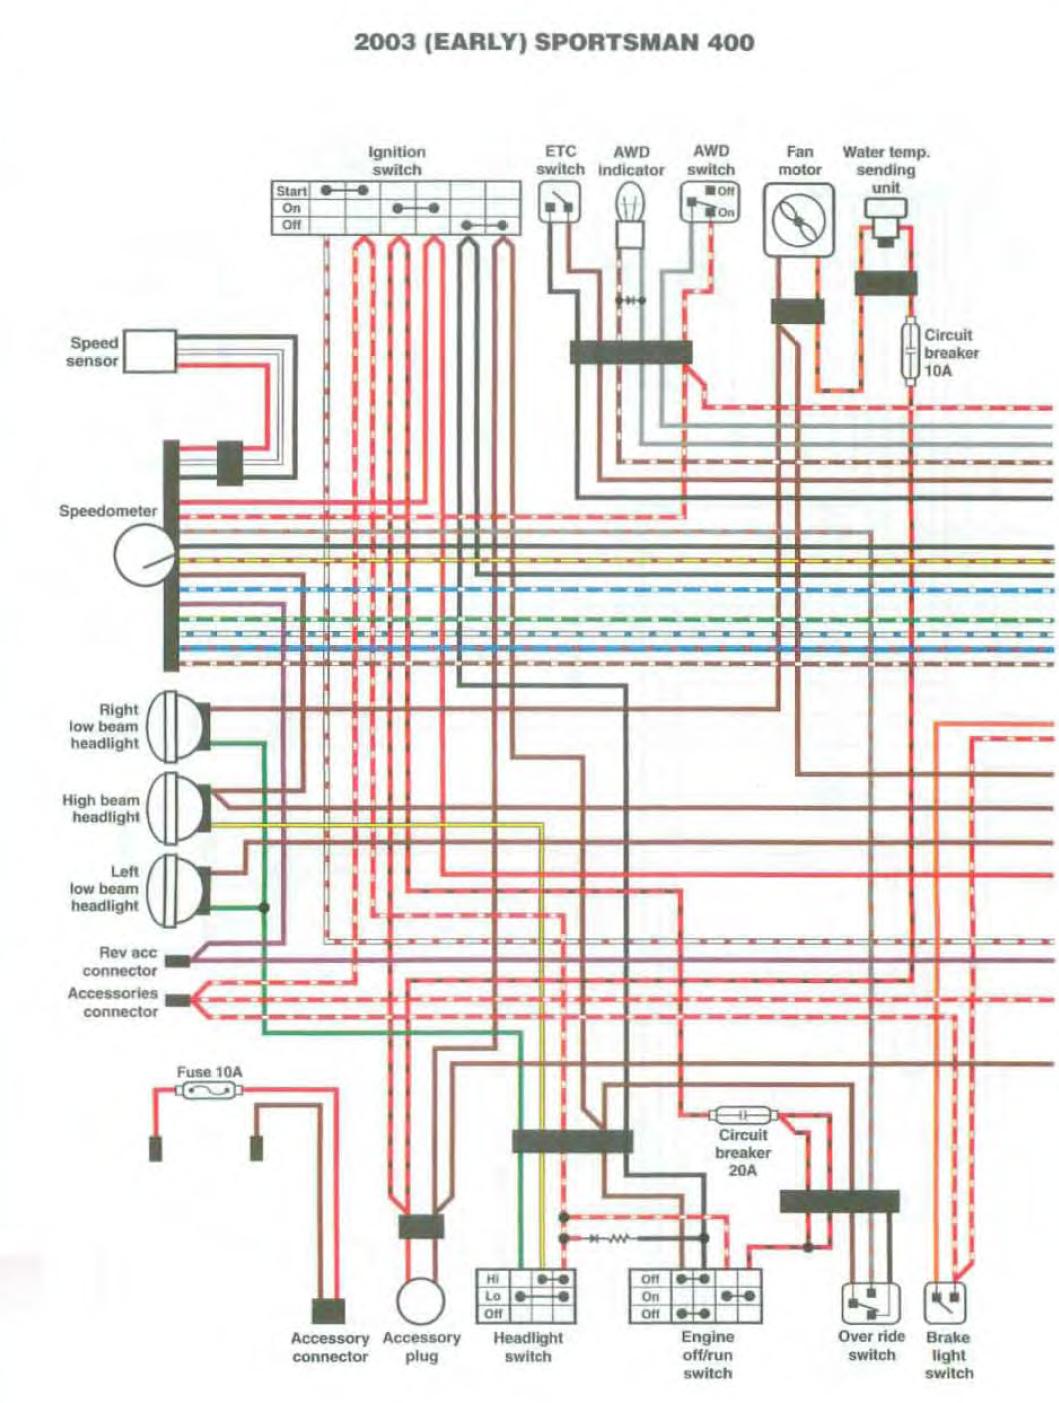 Sportsman 500 wiring diagram | Polaris ATV Forum | Sportsman 500 Wiring Diagram |  | Polaris ATV Forum